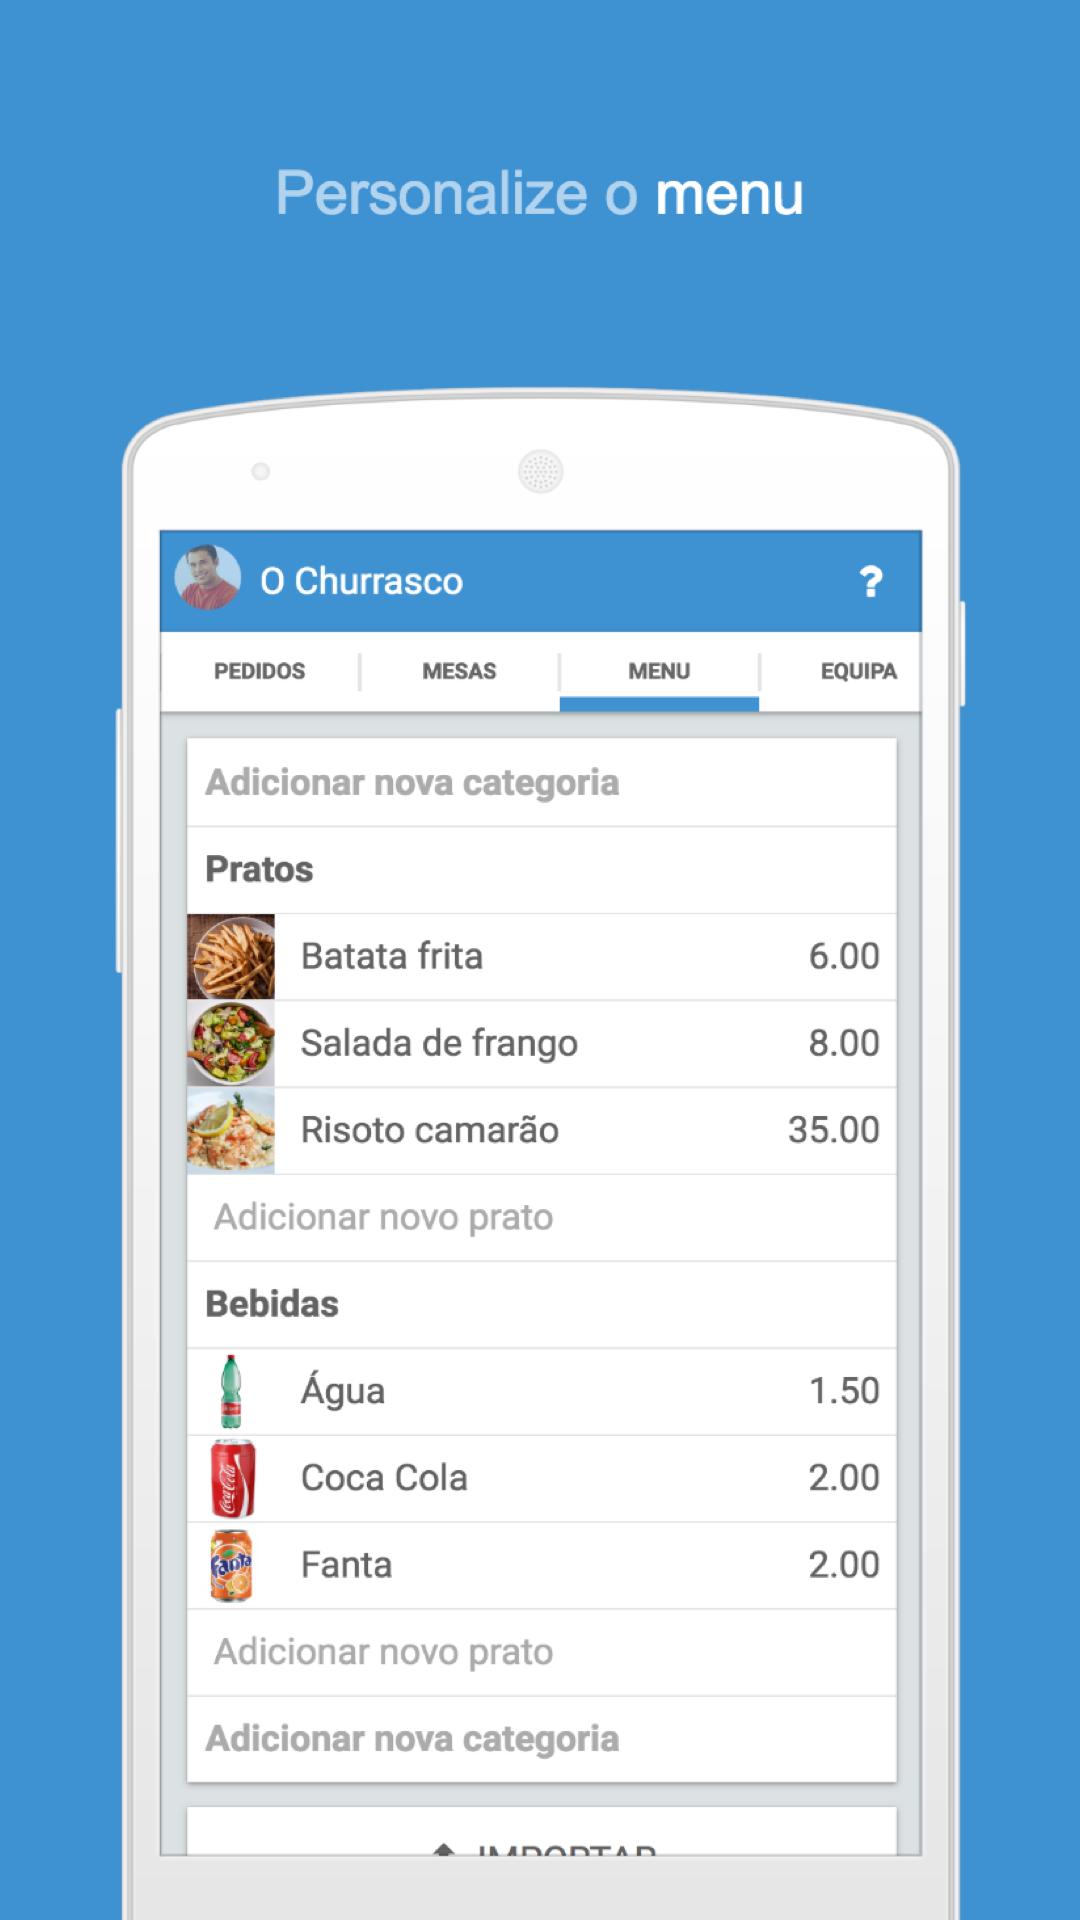 Garçom PDV Restaurante PDV Bar: Amazon.com.br: Amazon Appstore